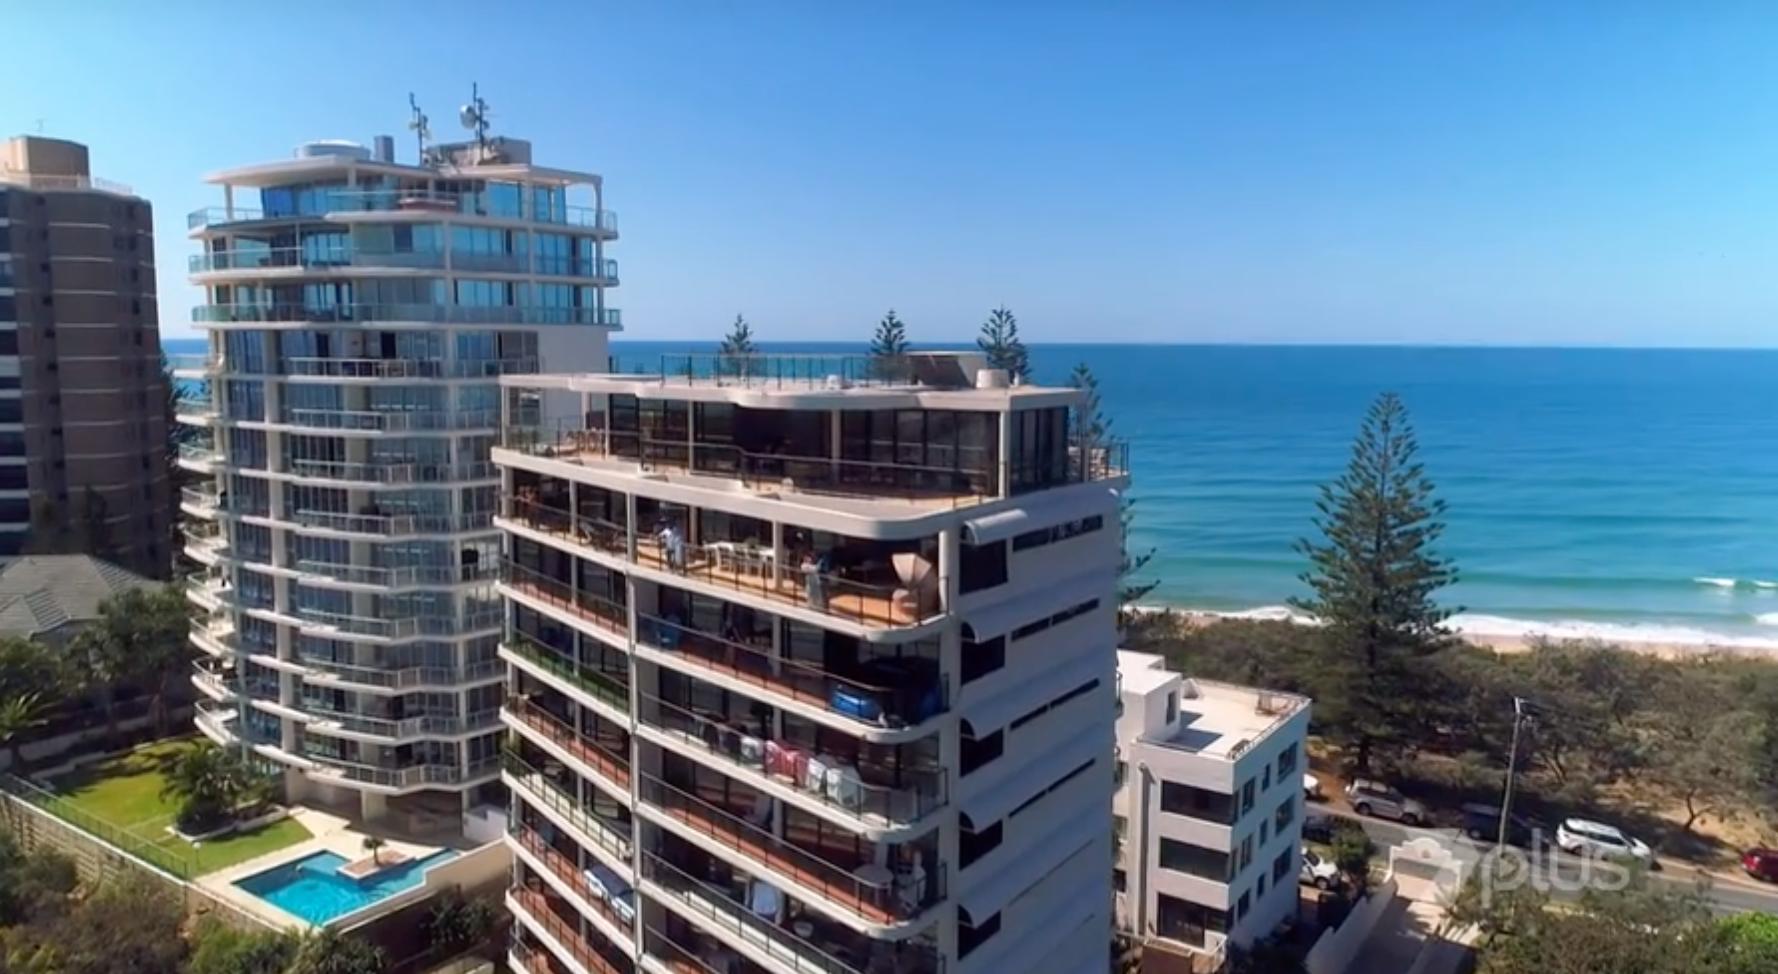 Instant Hotel - Sunny Coast Penhouse